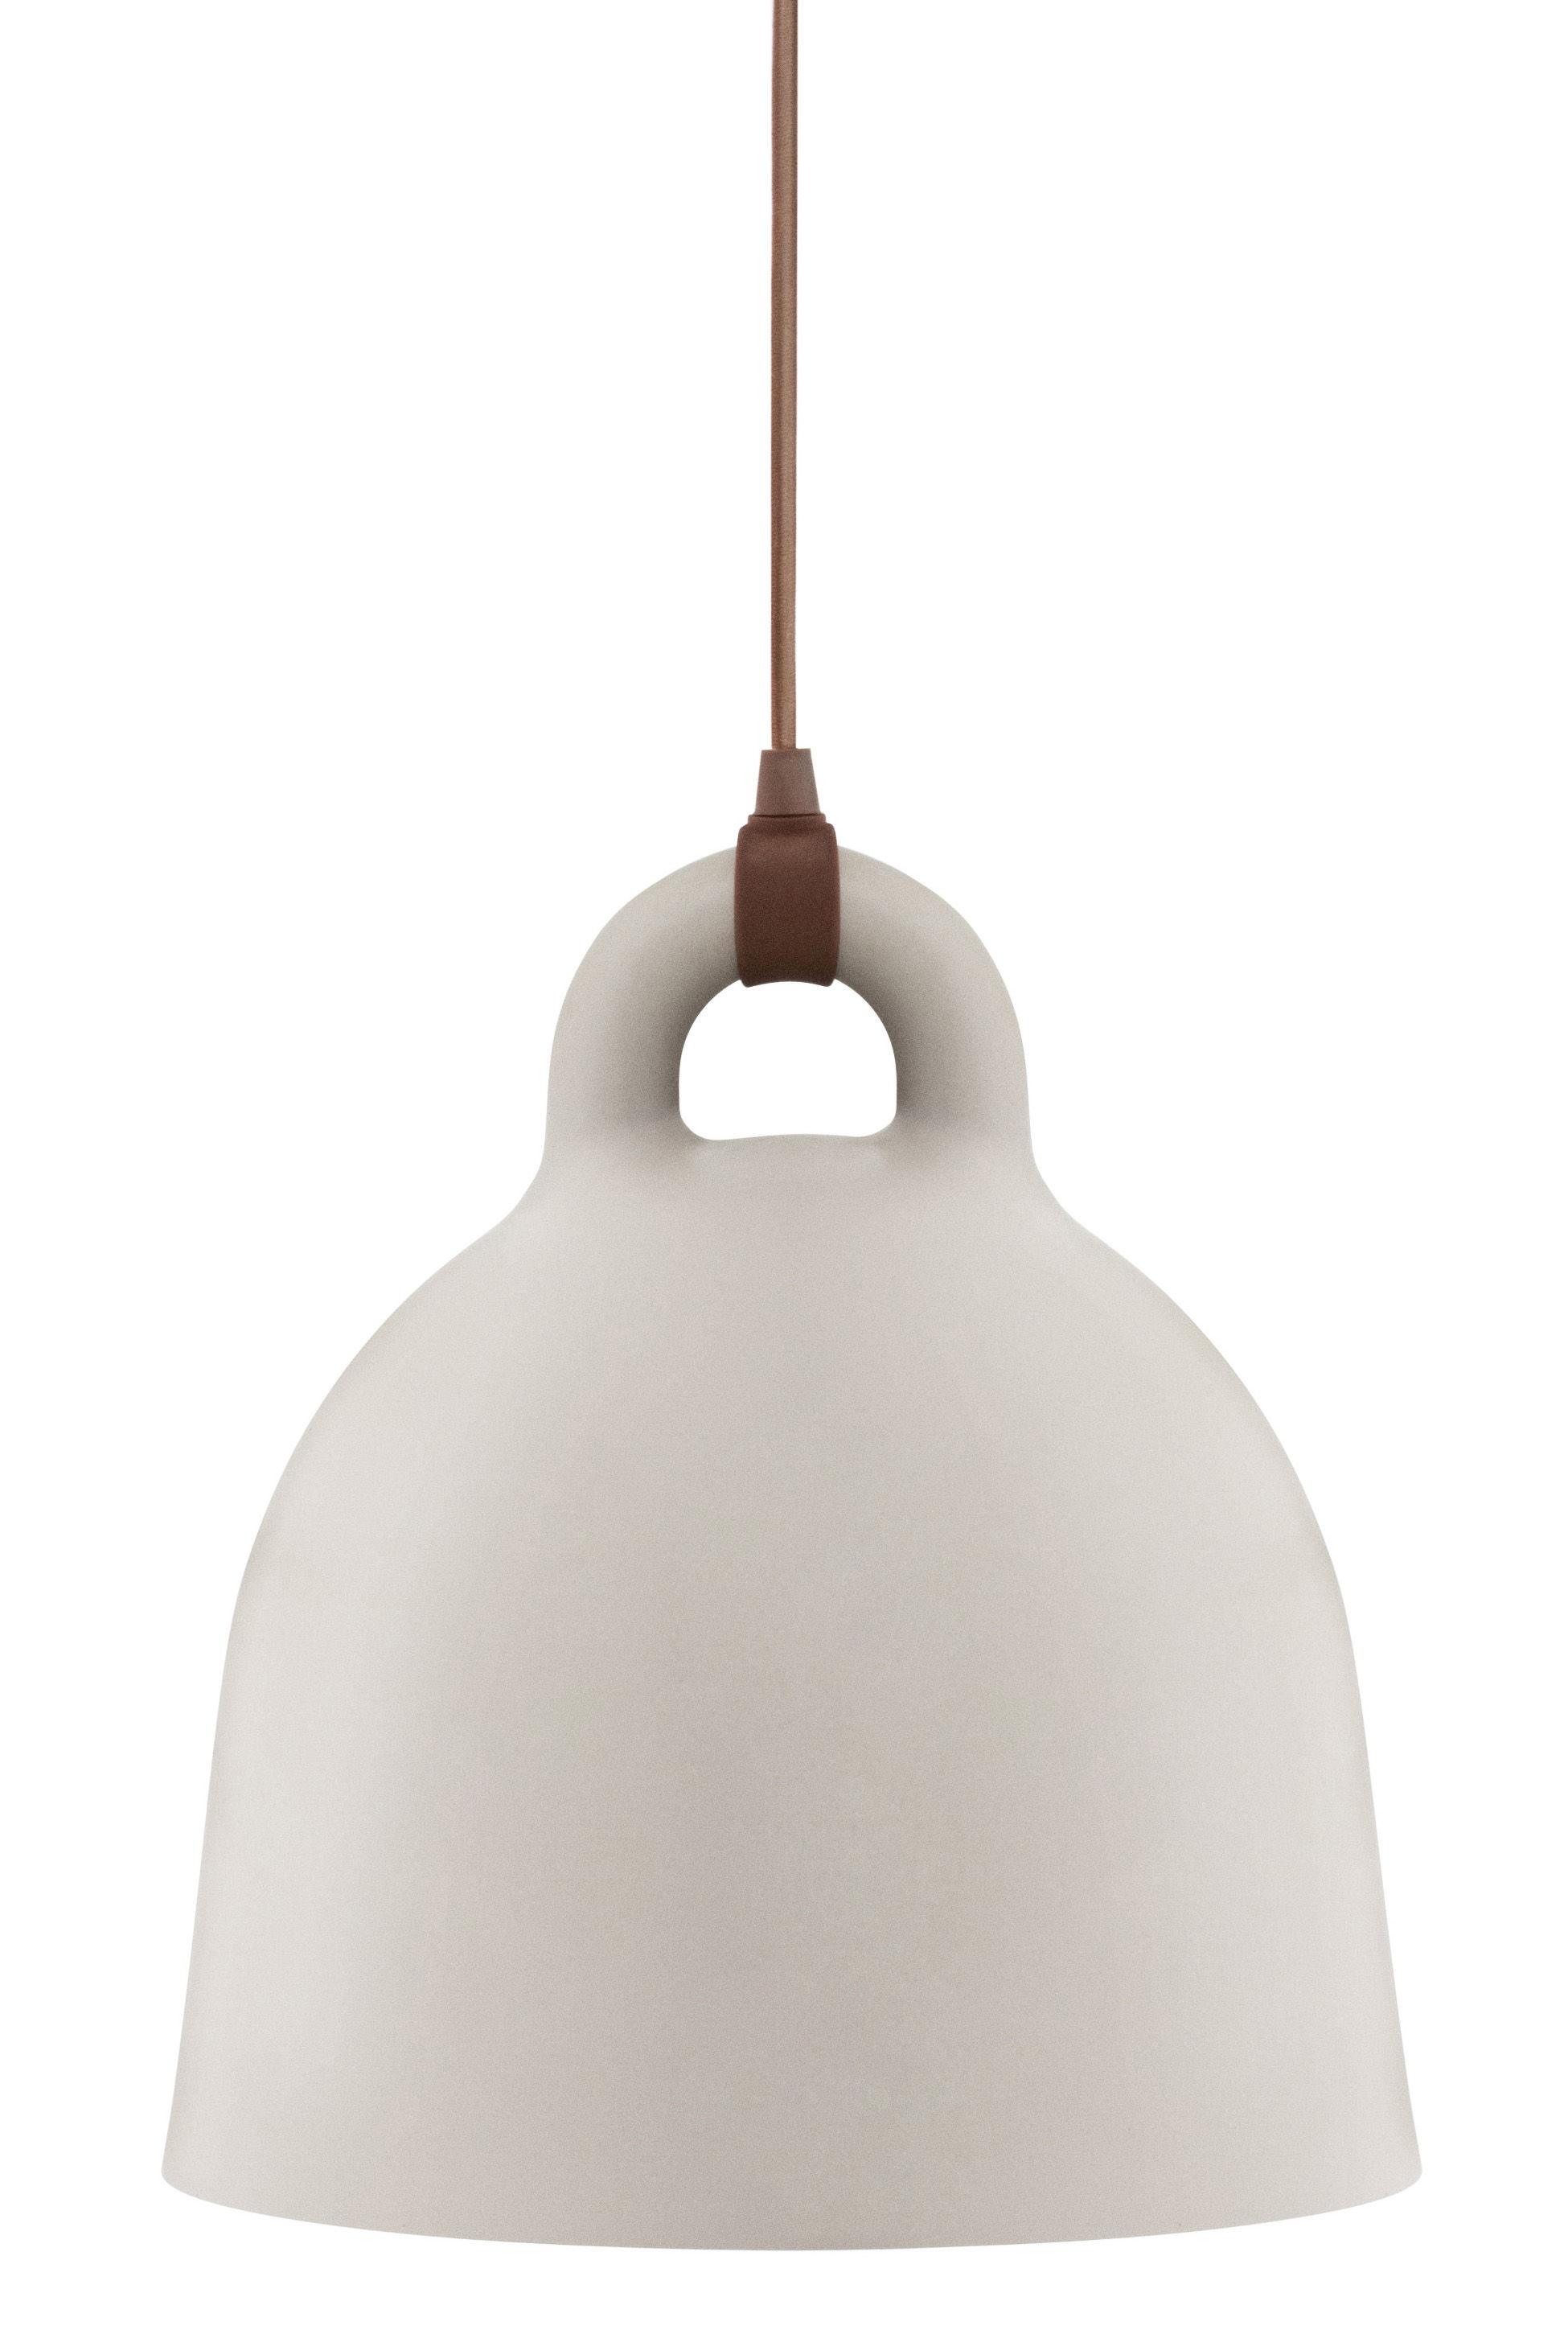 Luminaire - Suspensions - Suspension Bell / Large Ø 55 cm - Normann Copenhagen - Sable mat & Int. Blanc - Aluminium